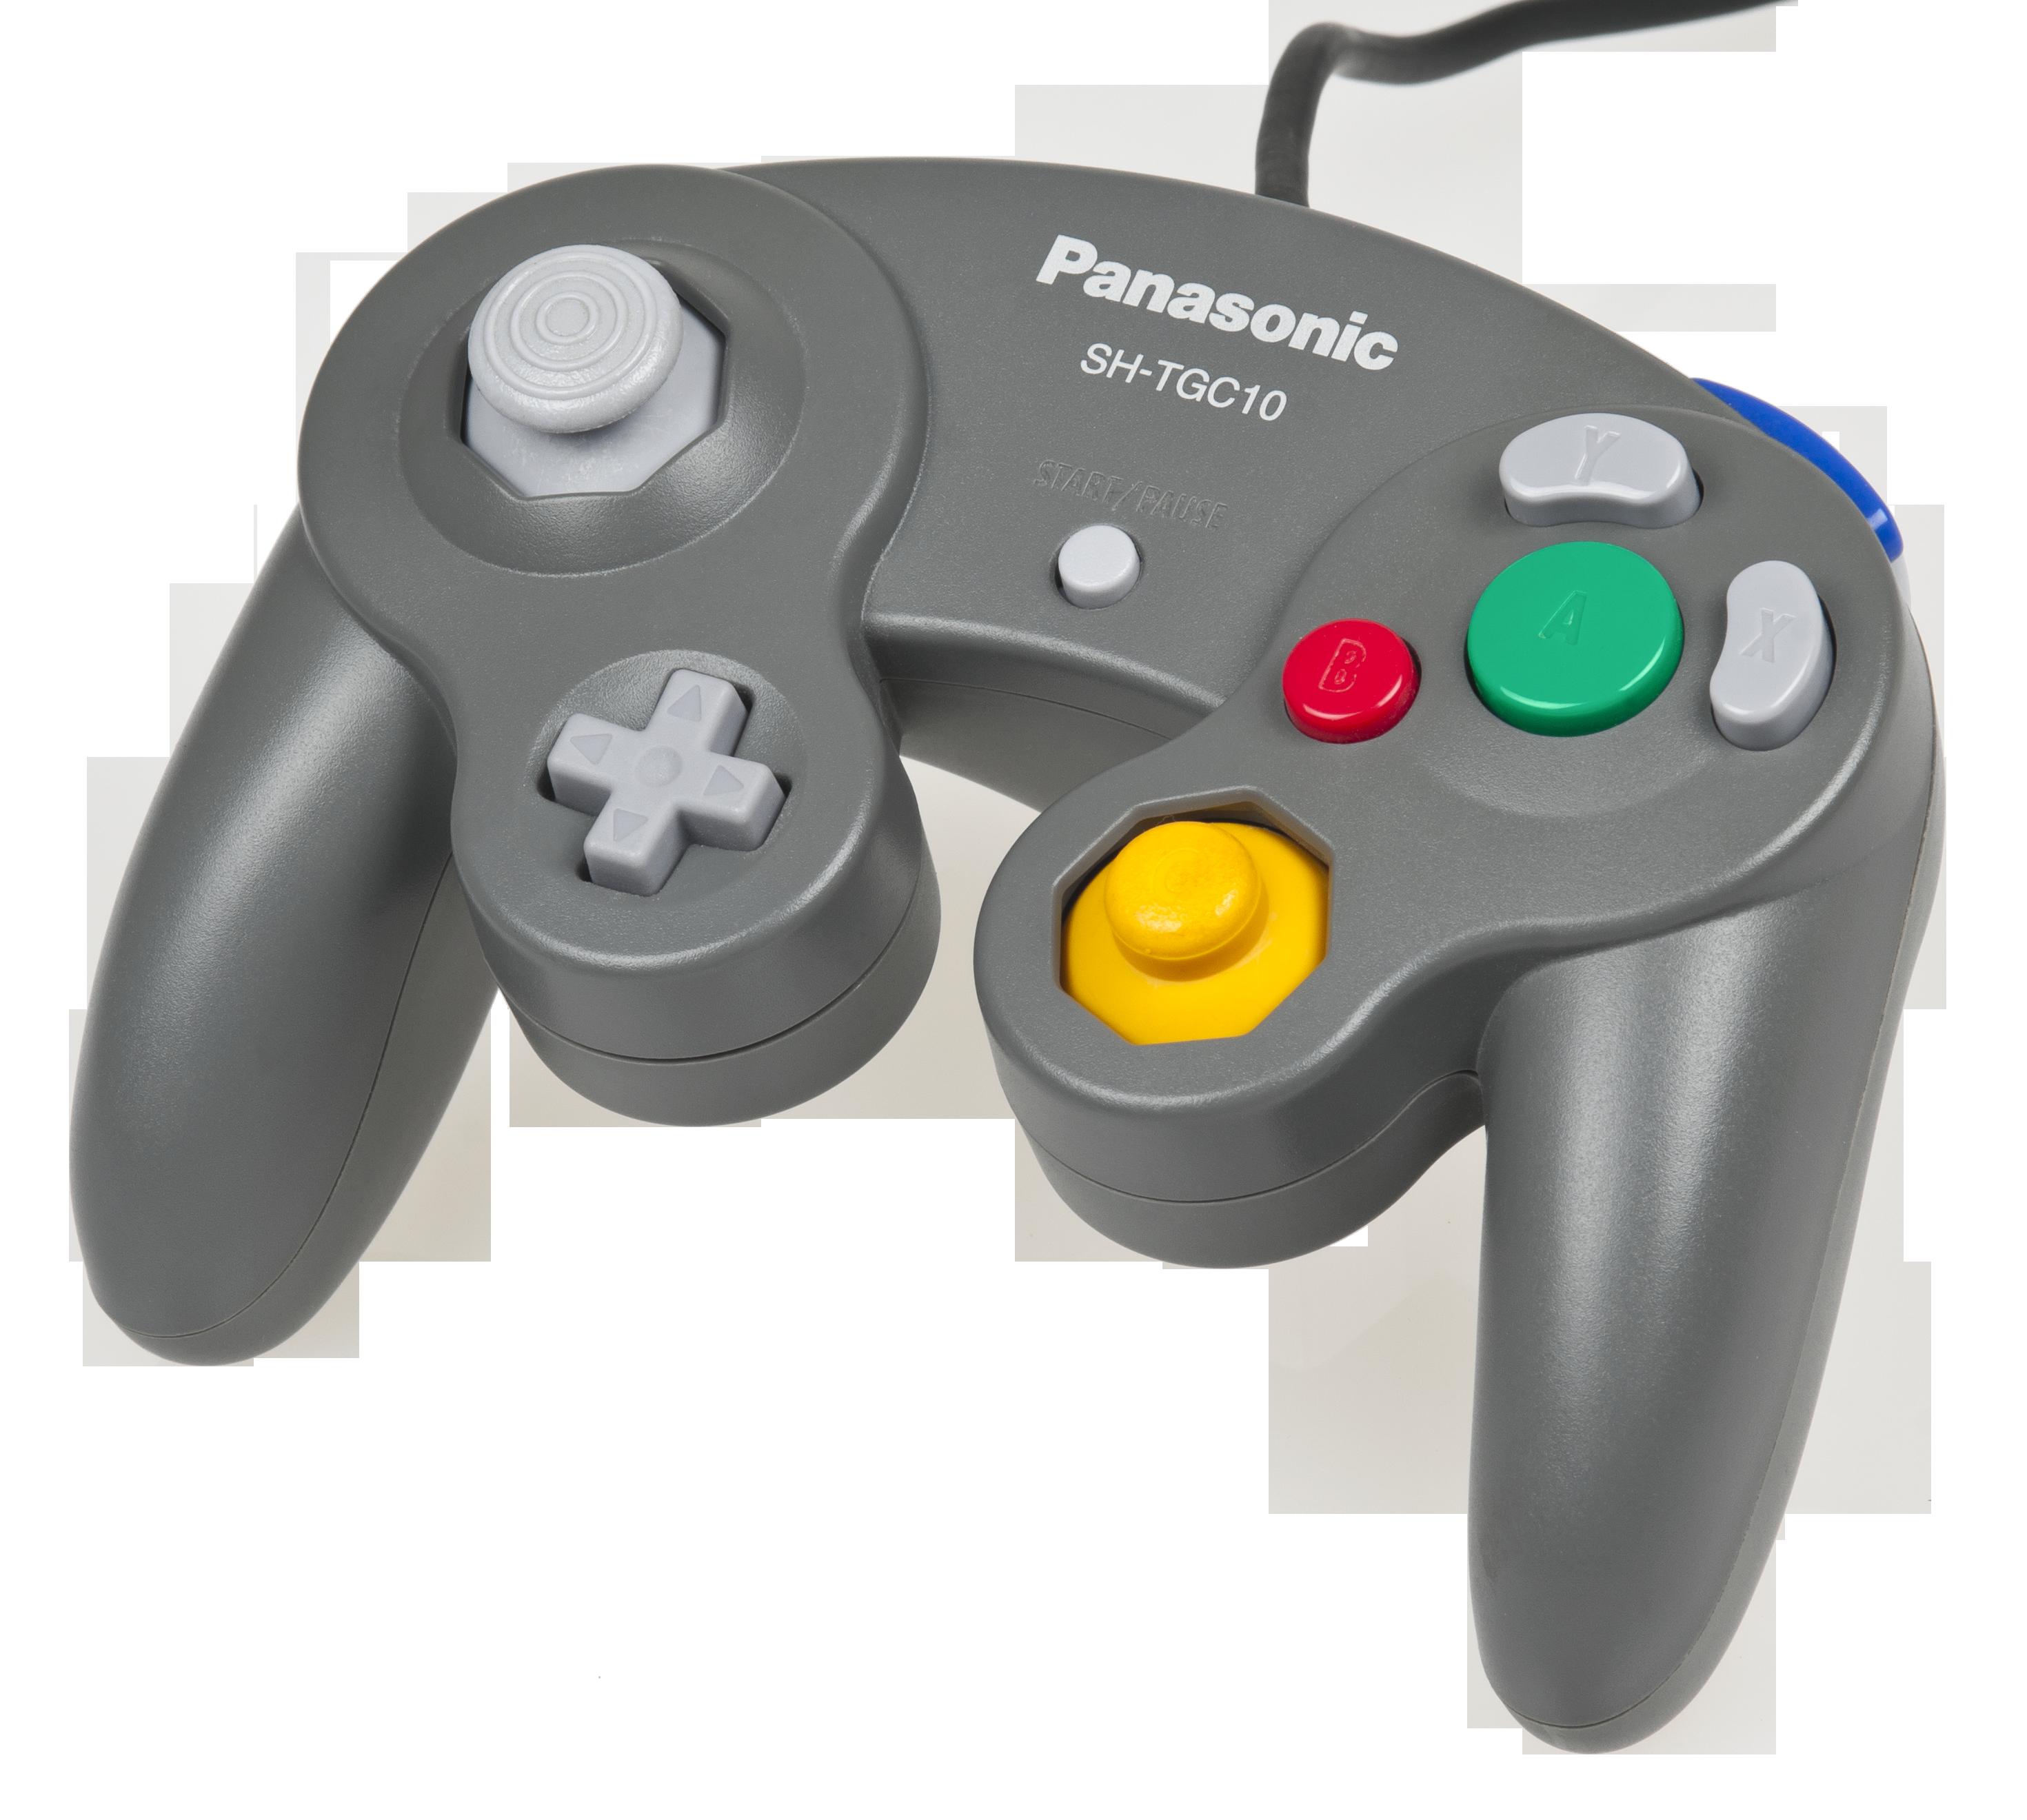 File:Panasonic-Q-Controller.png - Wikimedia Commons